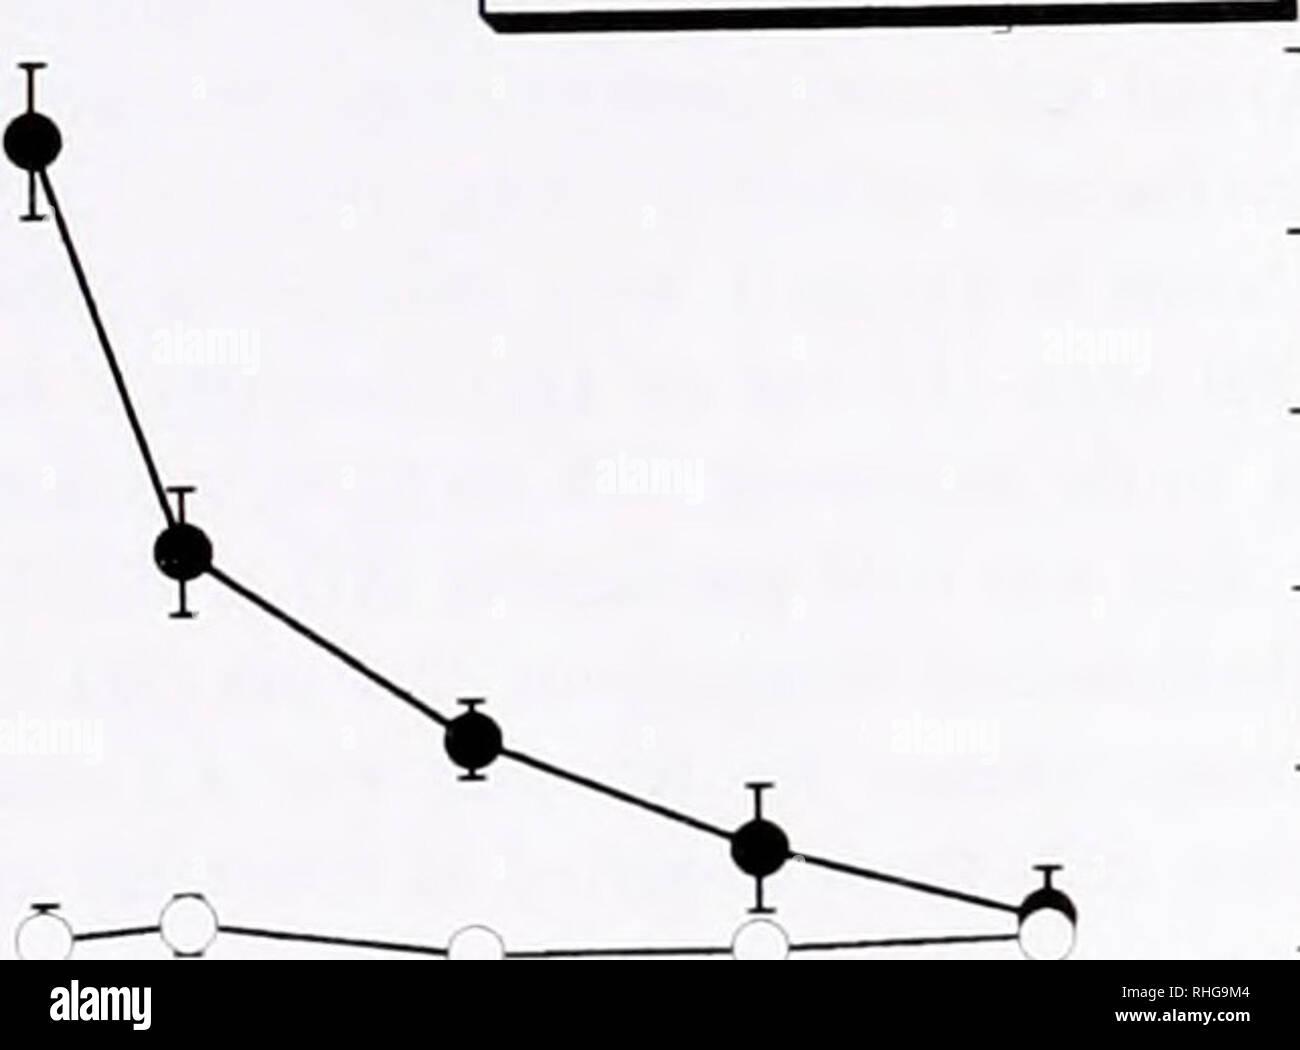 Pump Station Wiring Diagram Mci    Wiring Diagram